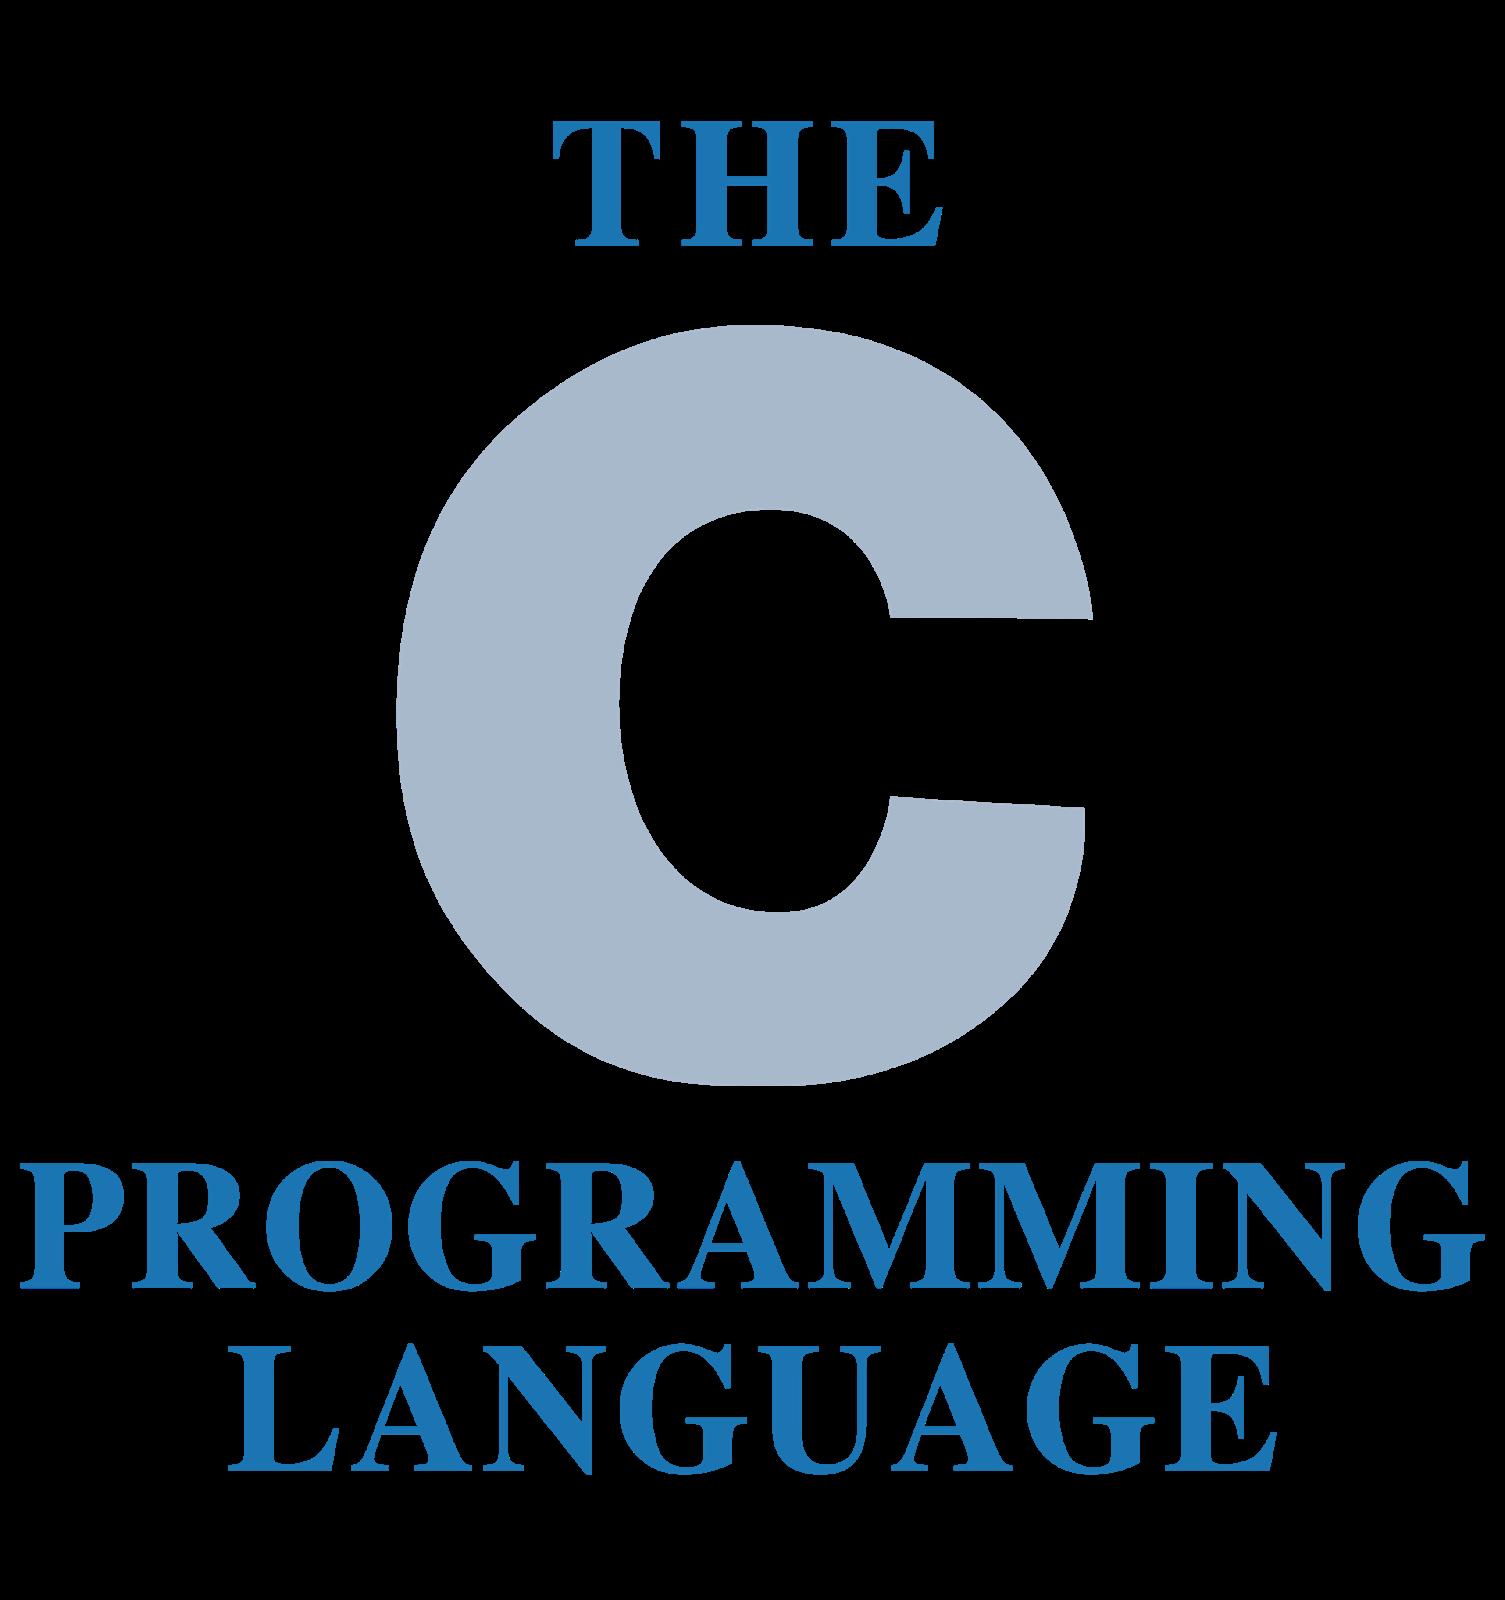 C programming language tutorial jnnc technologies jnnc c programming language tutorial jnnc technologies baditri Gallery